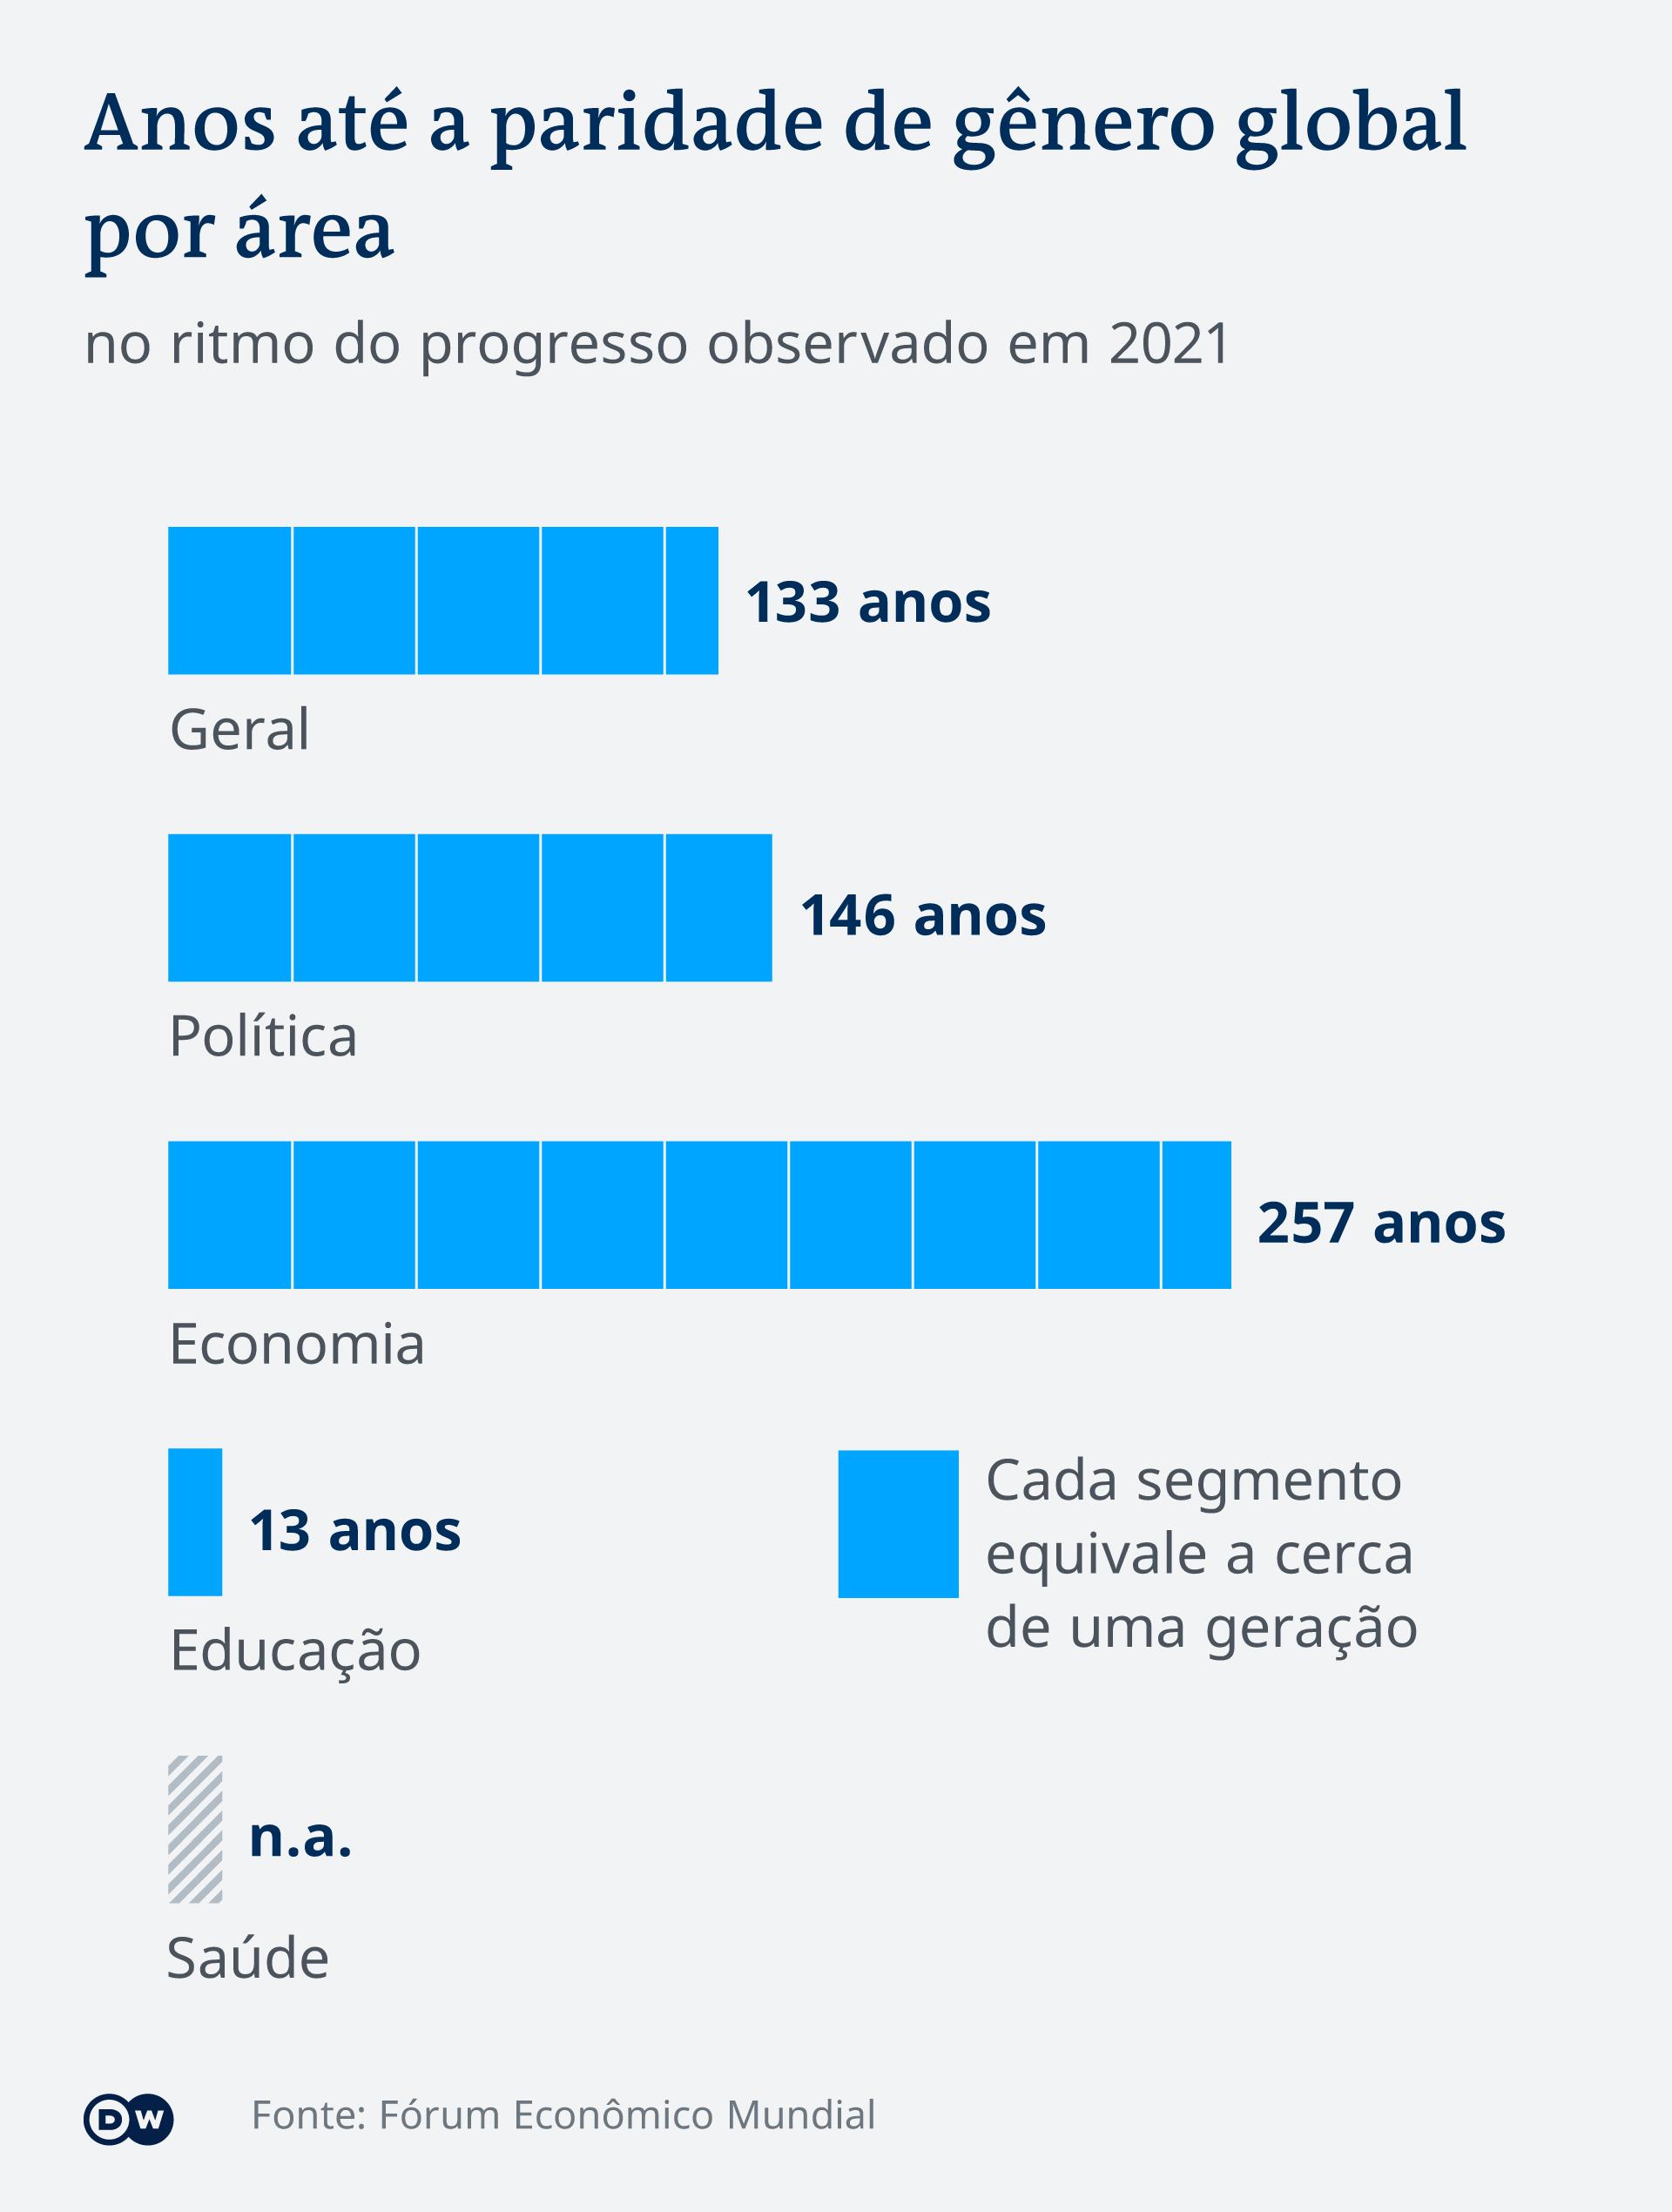 Infografik globale Gleichberechtigung nach Kategorien PT